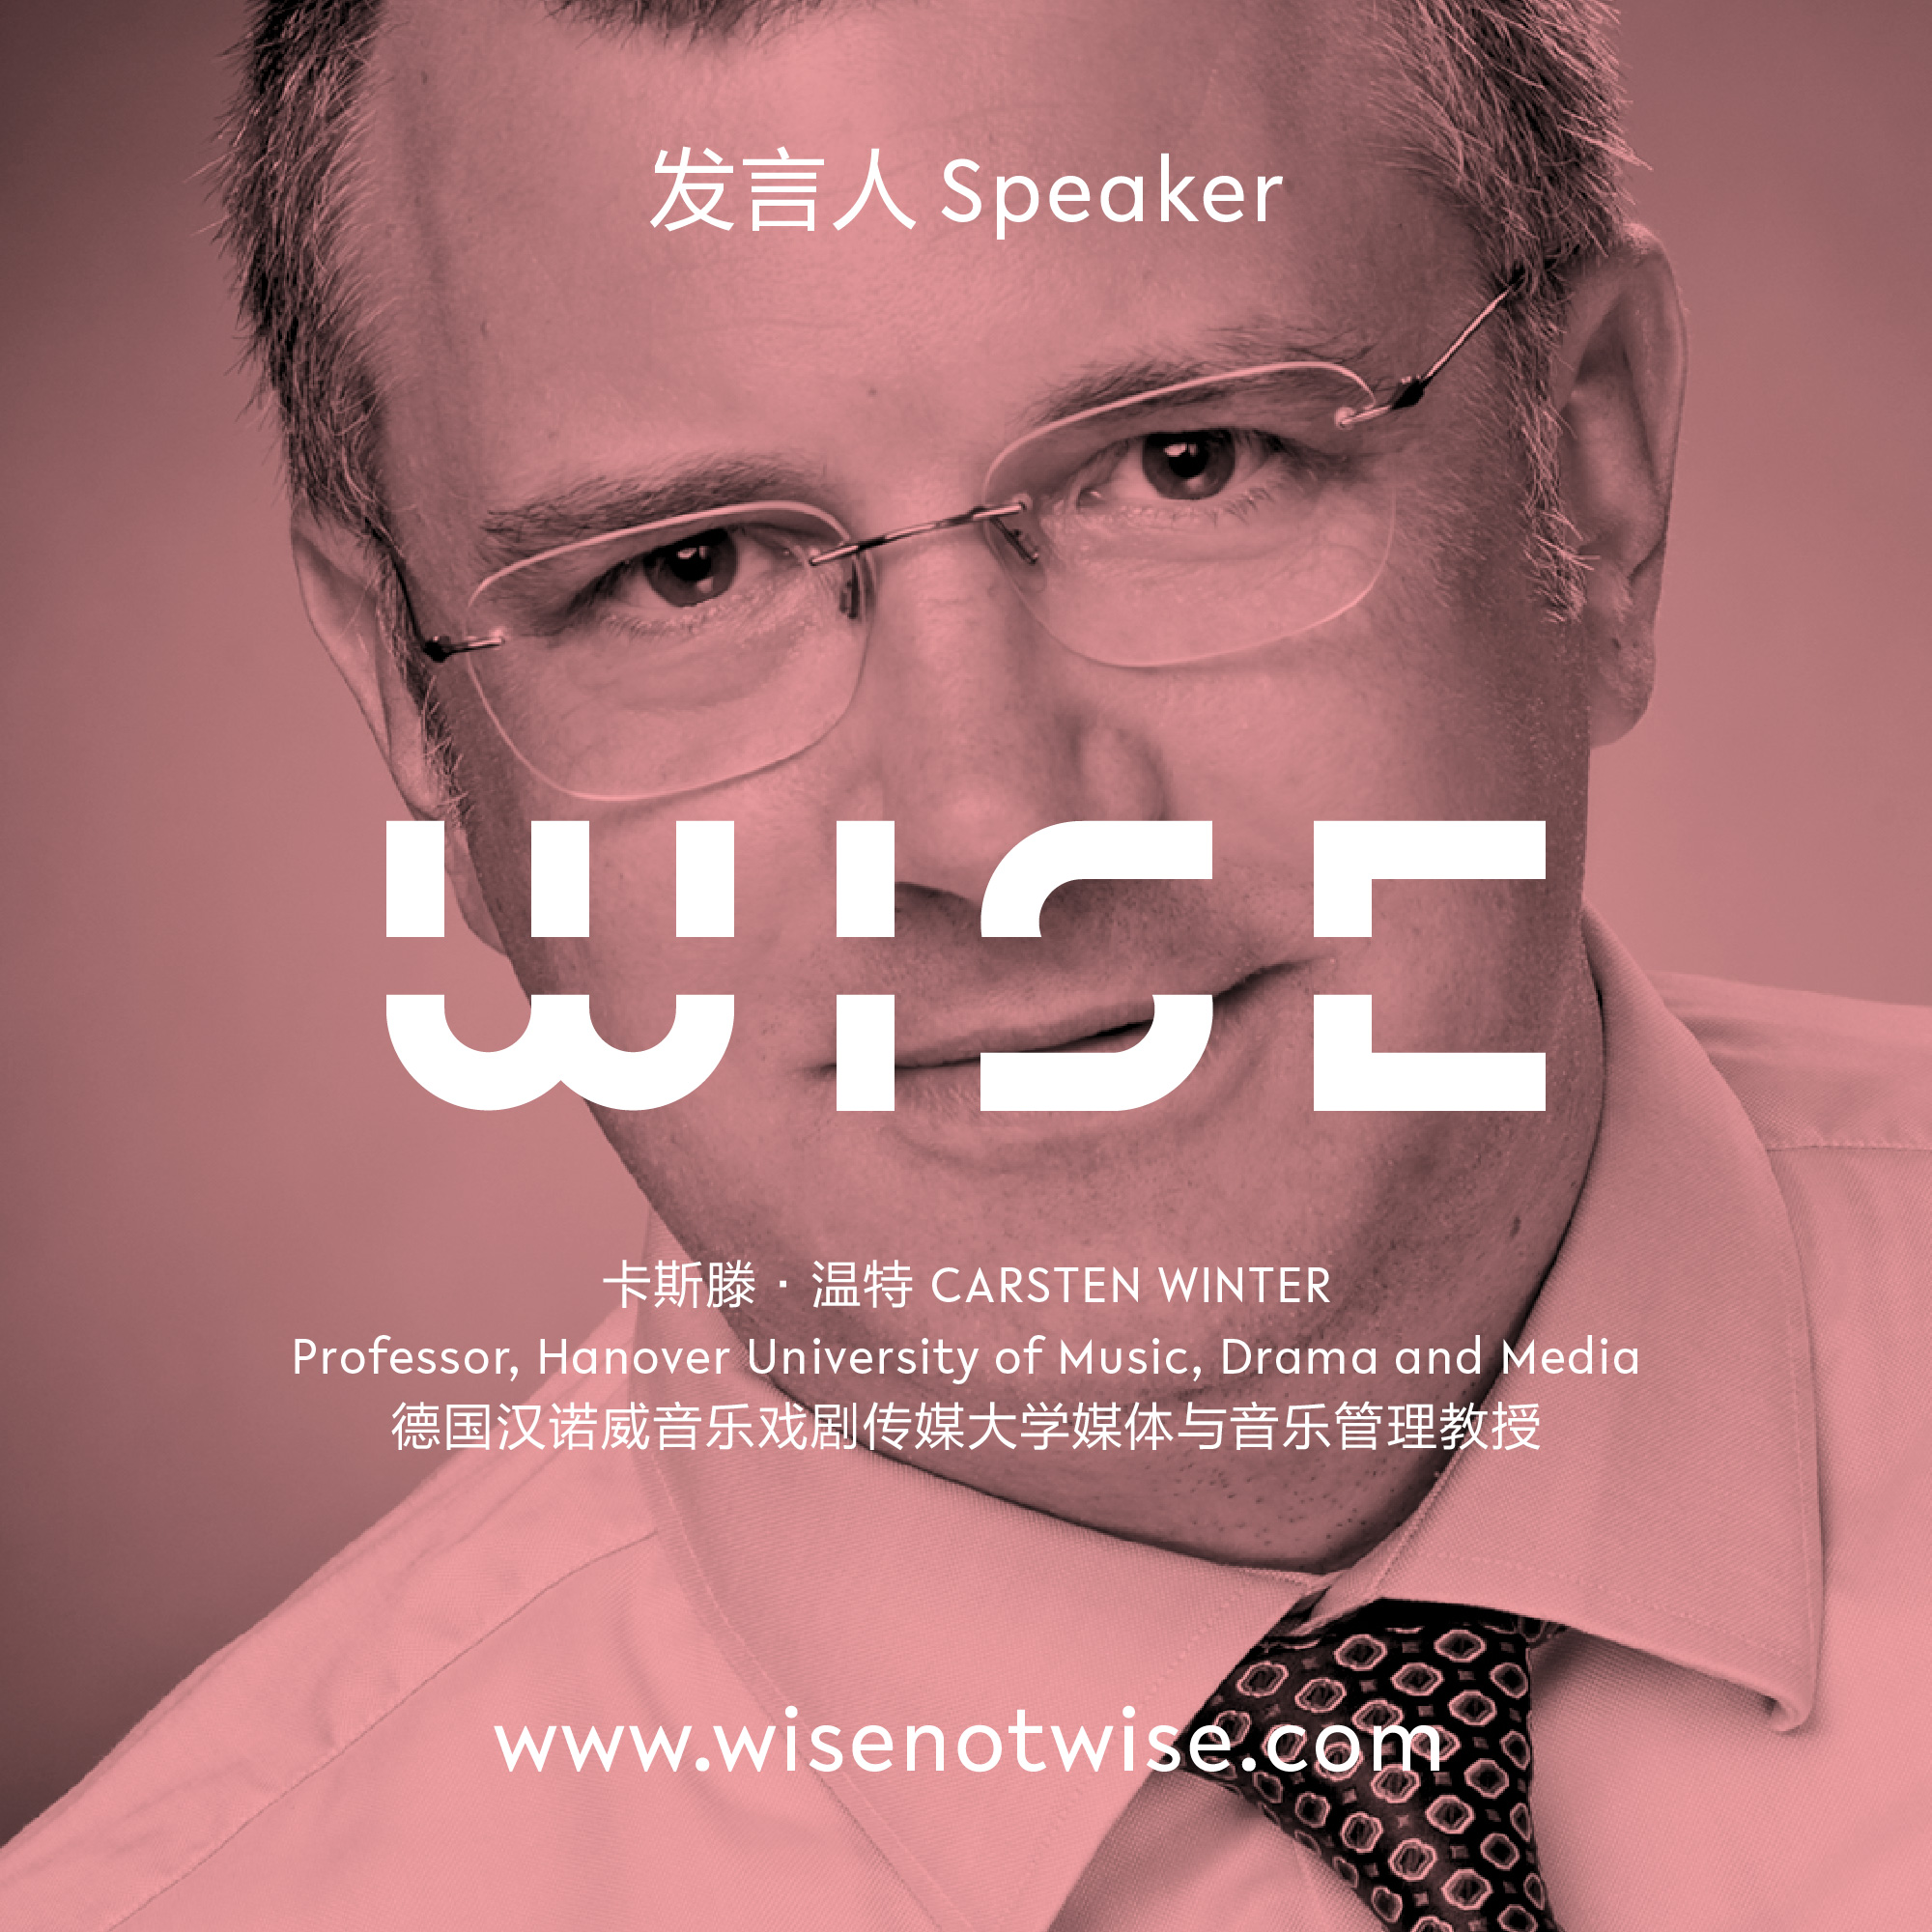 Carsten Winter, 德国汉诺威音乐戏剧传媒大学媒体与音乐管理教授